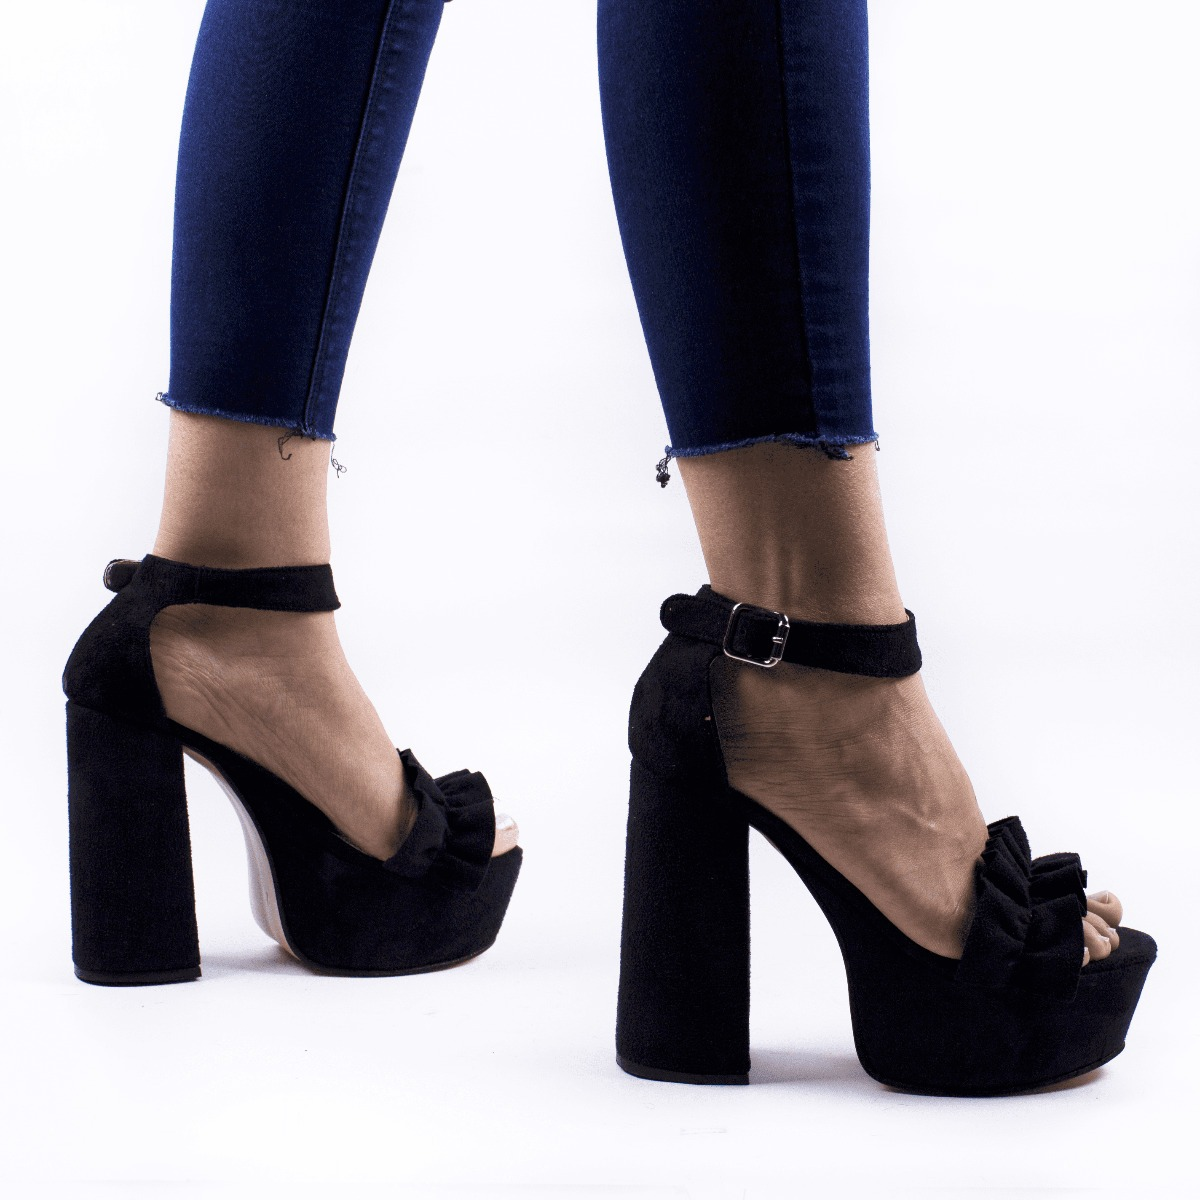 6cb71bce180 zapato sandalia mujer fiesta taco alto plataforma gamuza. Cargando zoom... zapato  sandalia mujer. Cargando zoom.